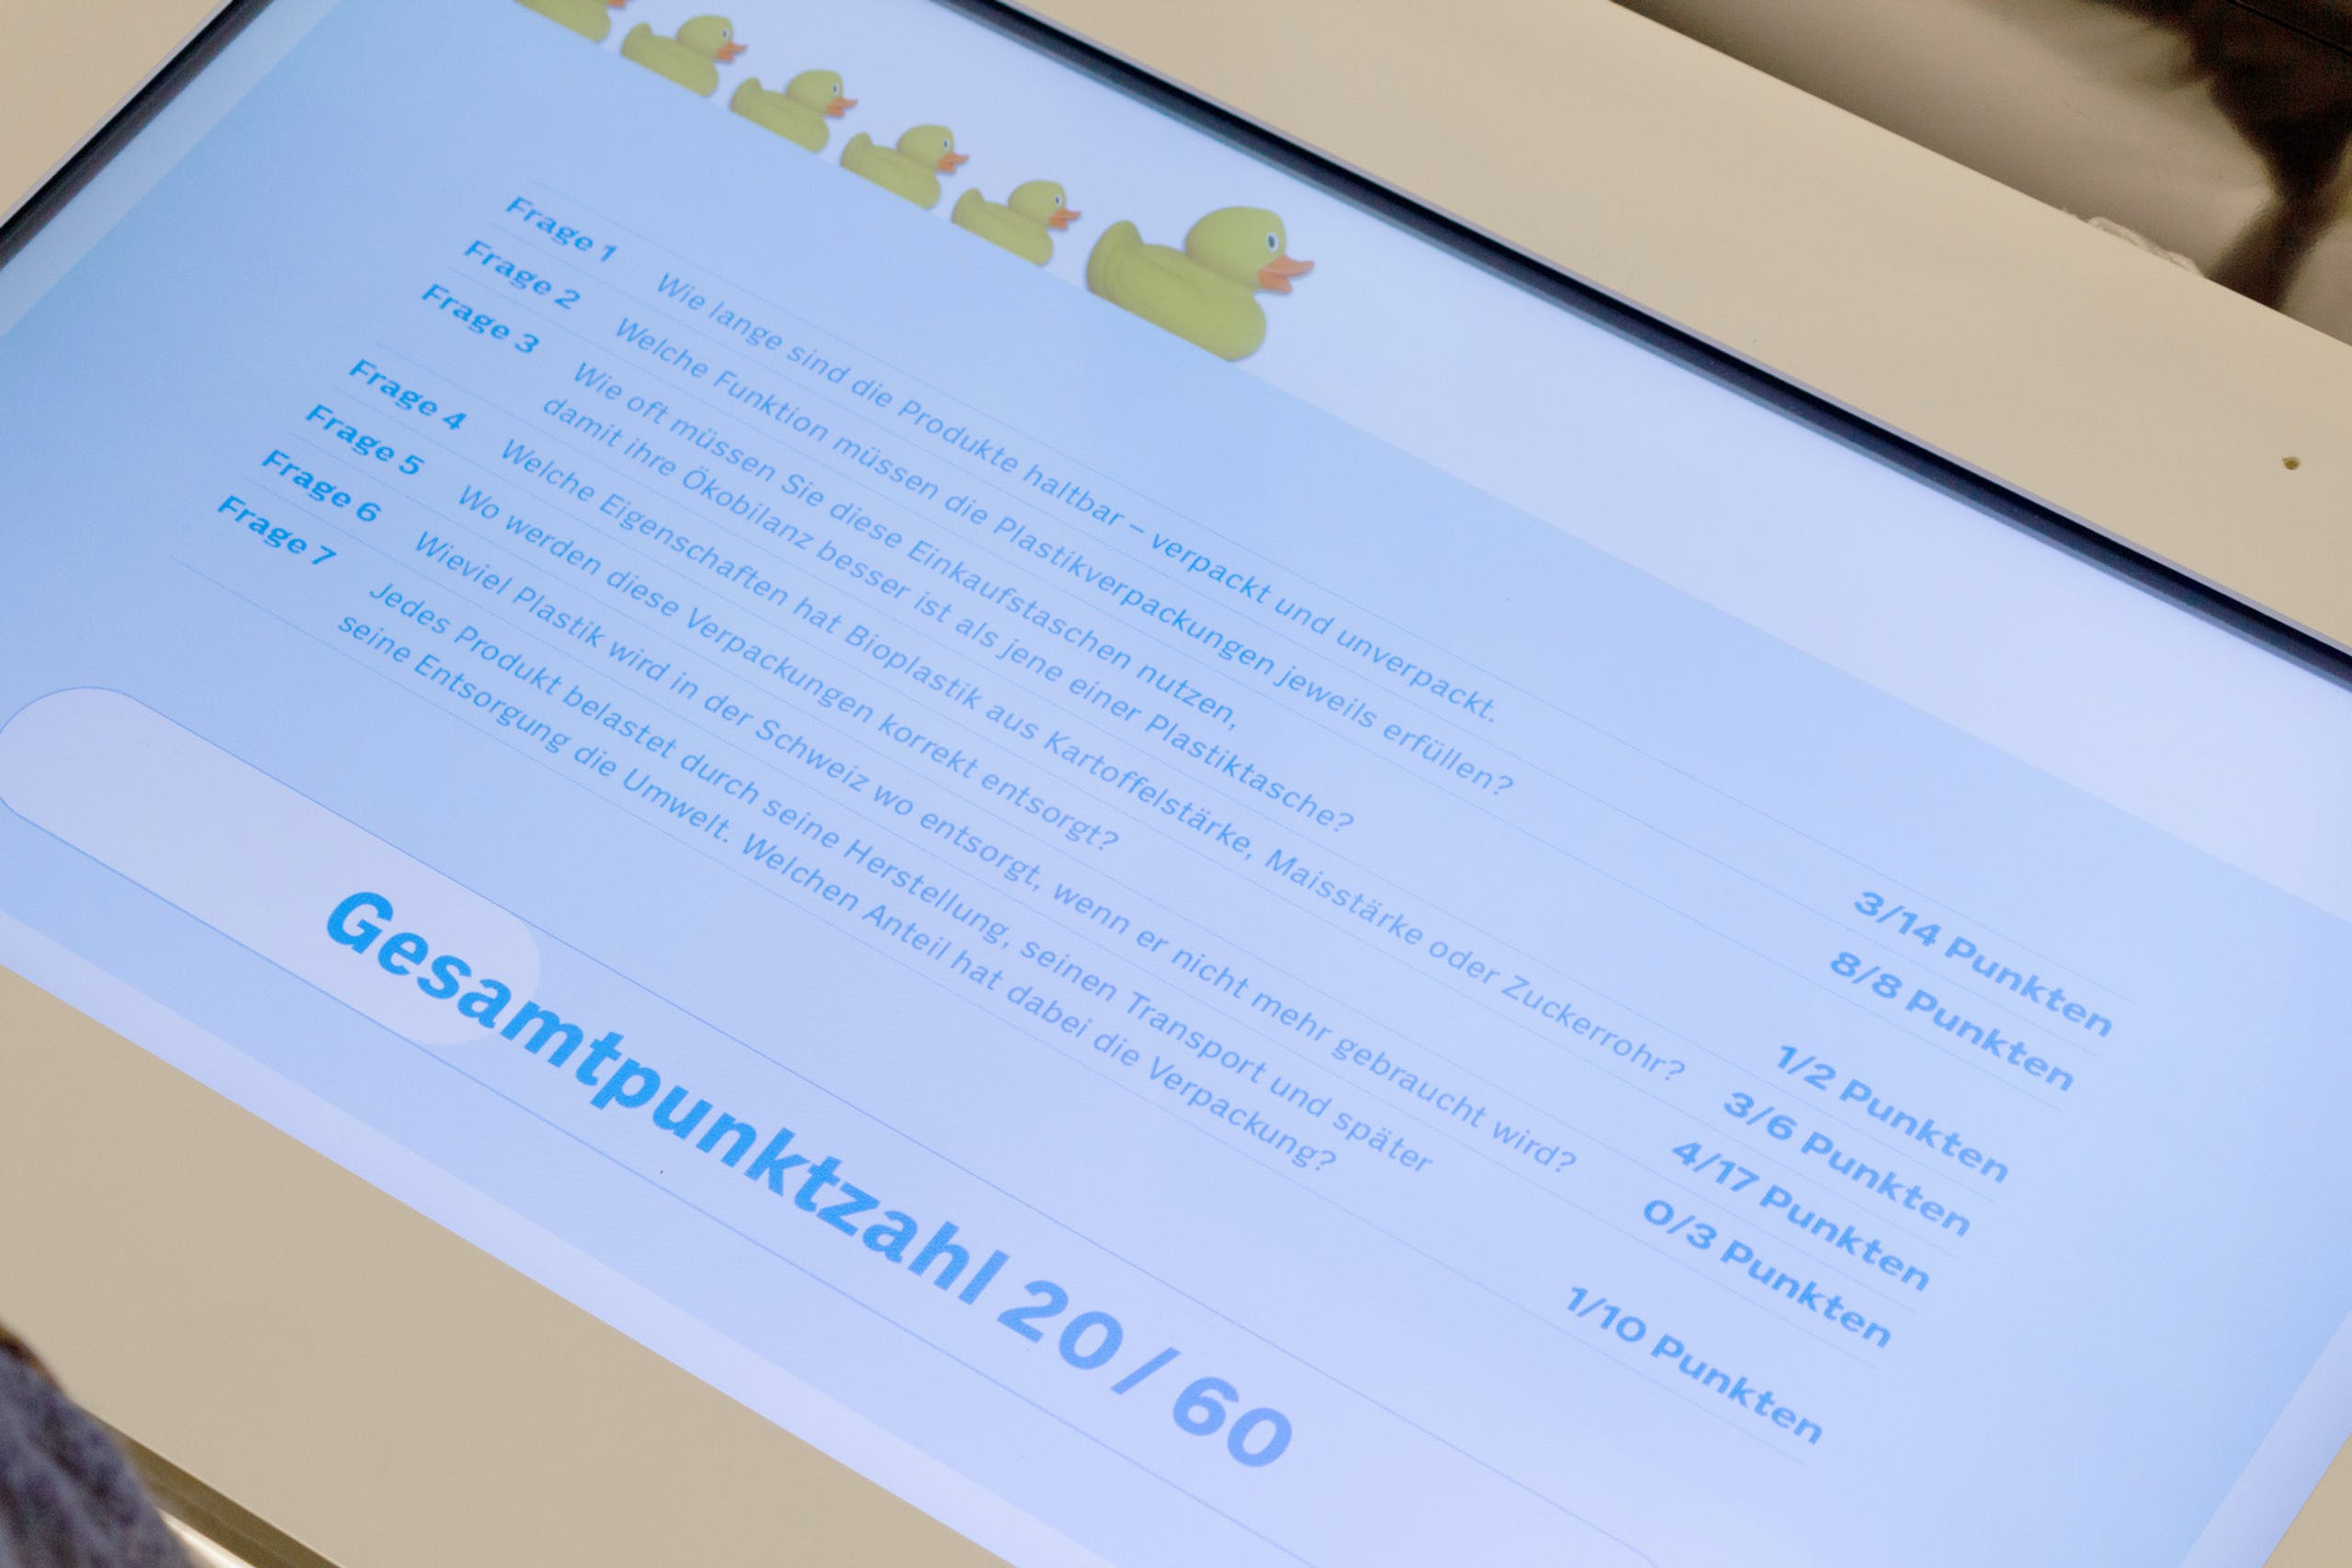 Cedric Kegreiss, Coop, Plastik, Game, Grafik, Design, Gestaltung, Spreitenbach, Basel, Ausstellung, Interaction-Design, Screen-Design, Migros, Plastic